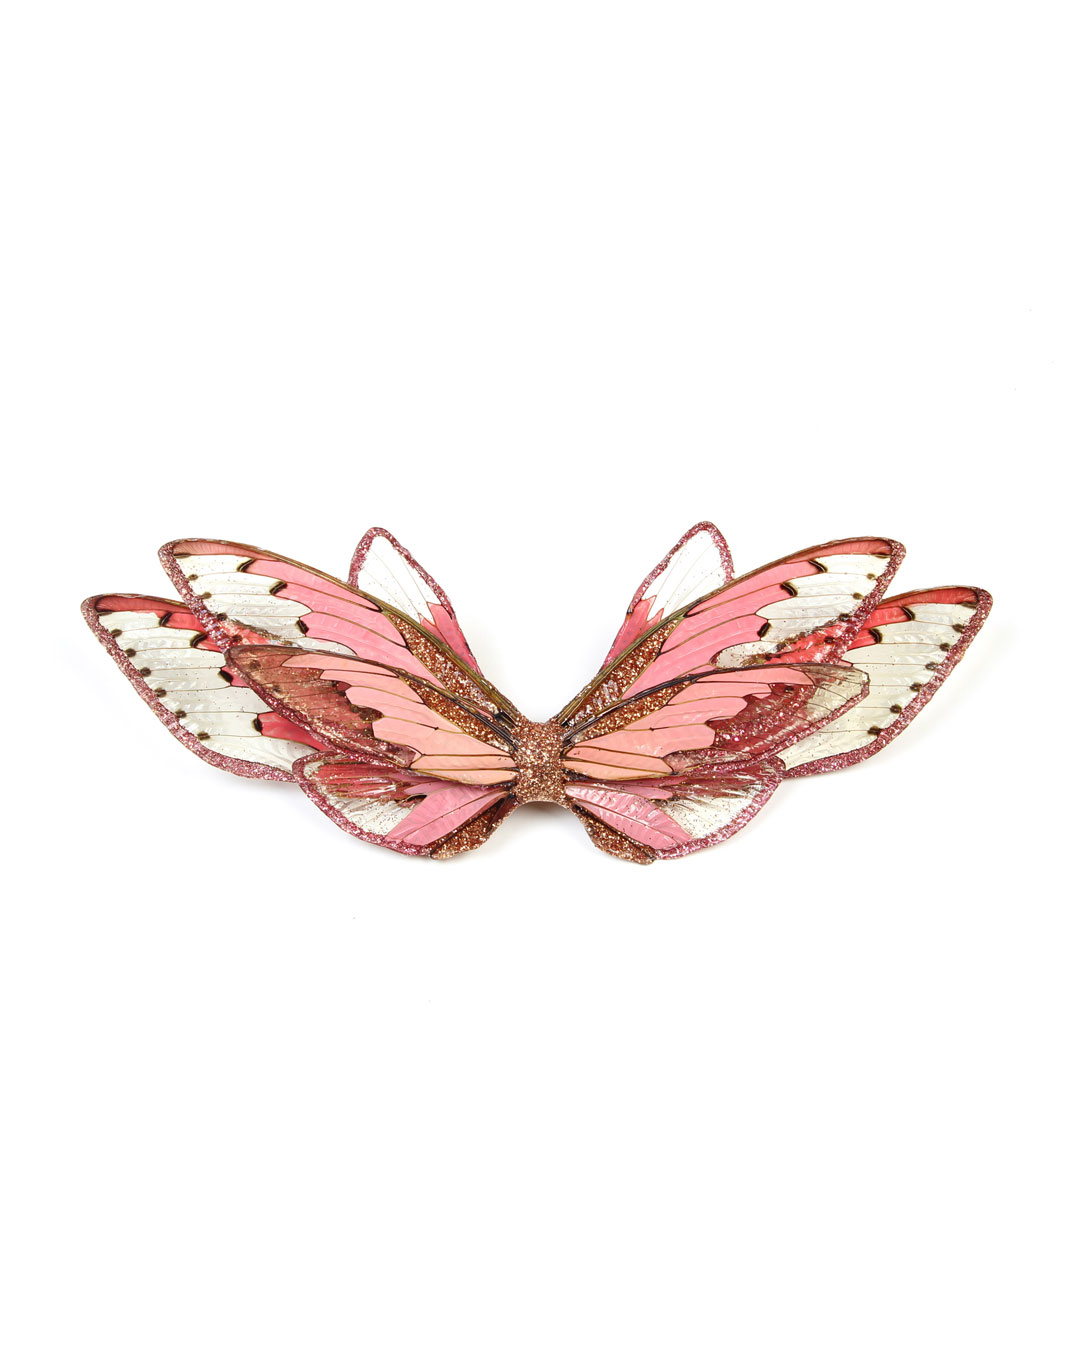 Märta Mattsson, Wings, 2015, broche; cicadas, hars, pigment, zilver, 170 x 80 x 20 mm